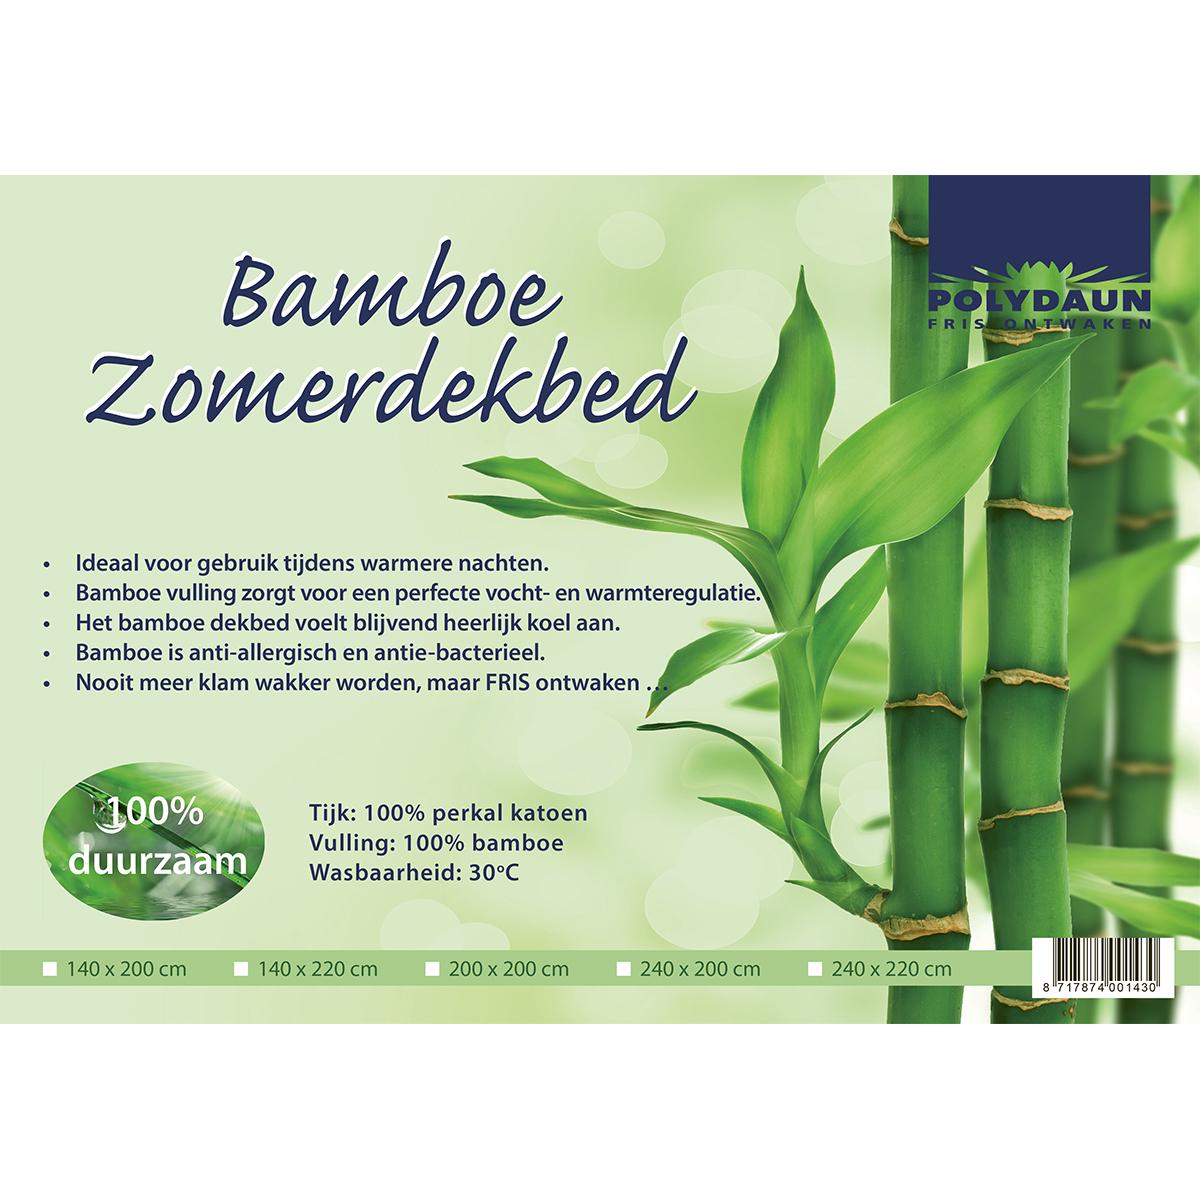 Polydaun bamboe zomerdekbed